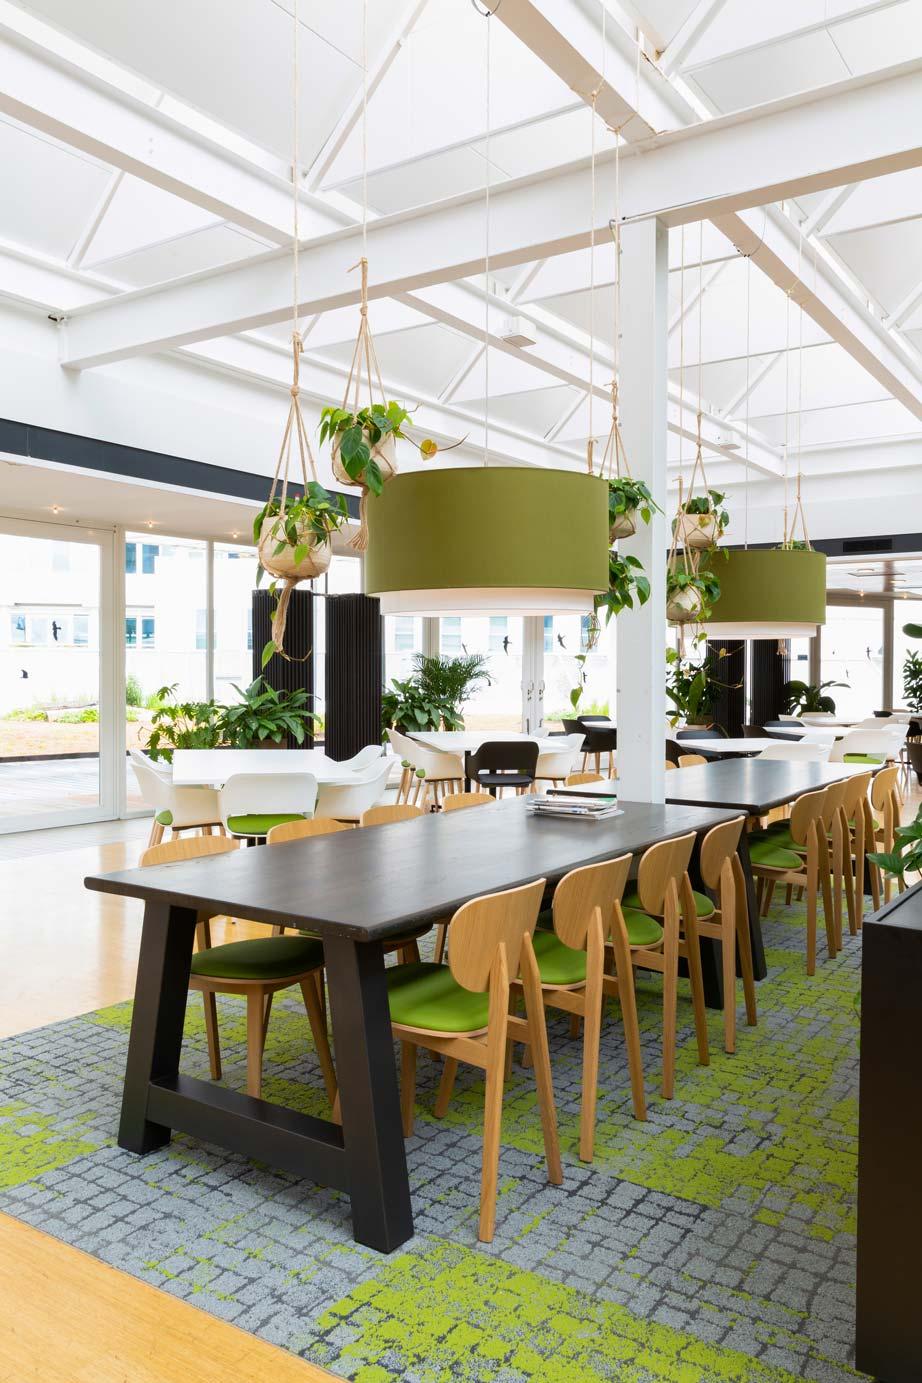 Urban-jugle-bedrijfsrestaurant-2.jpg